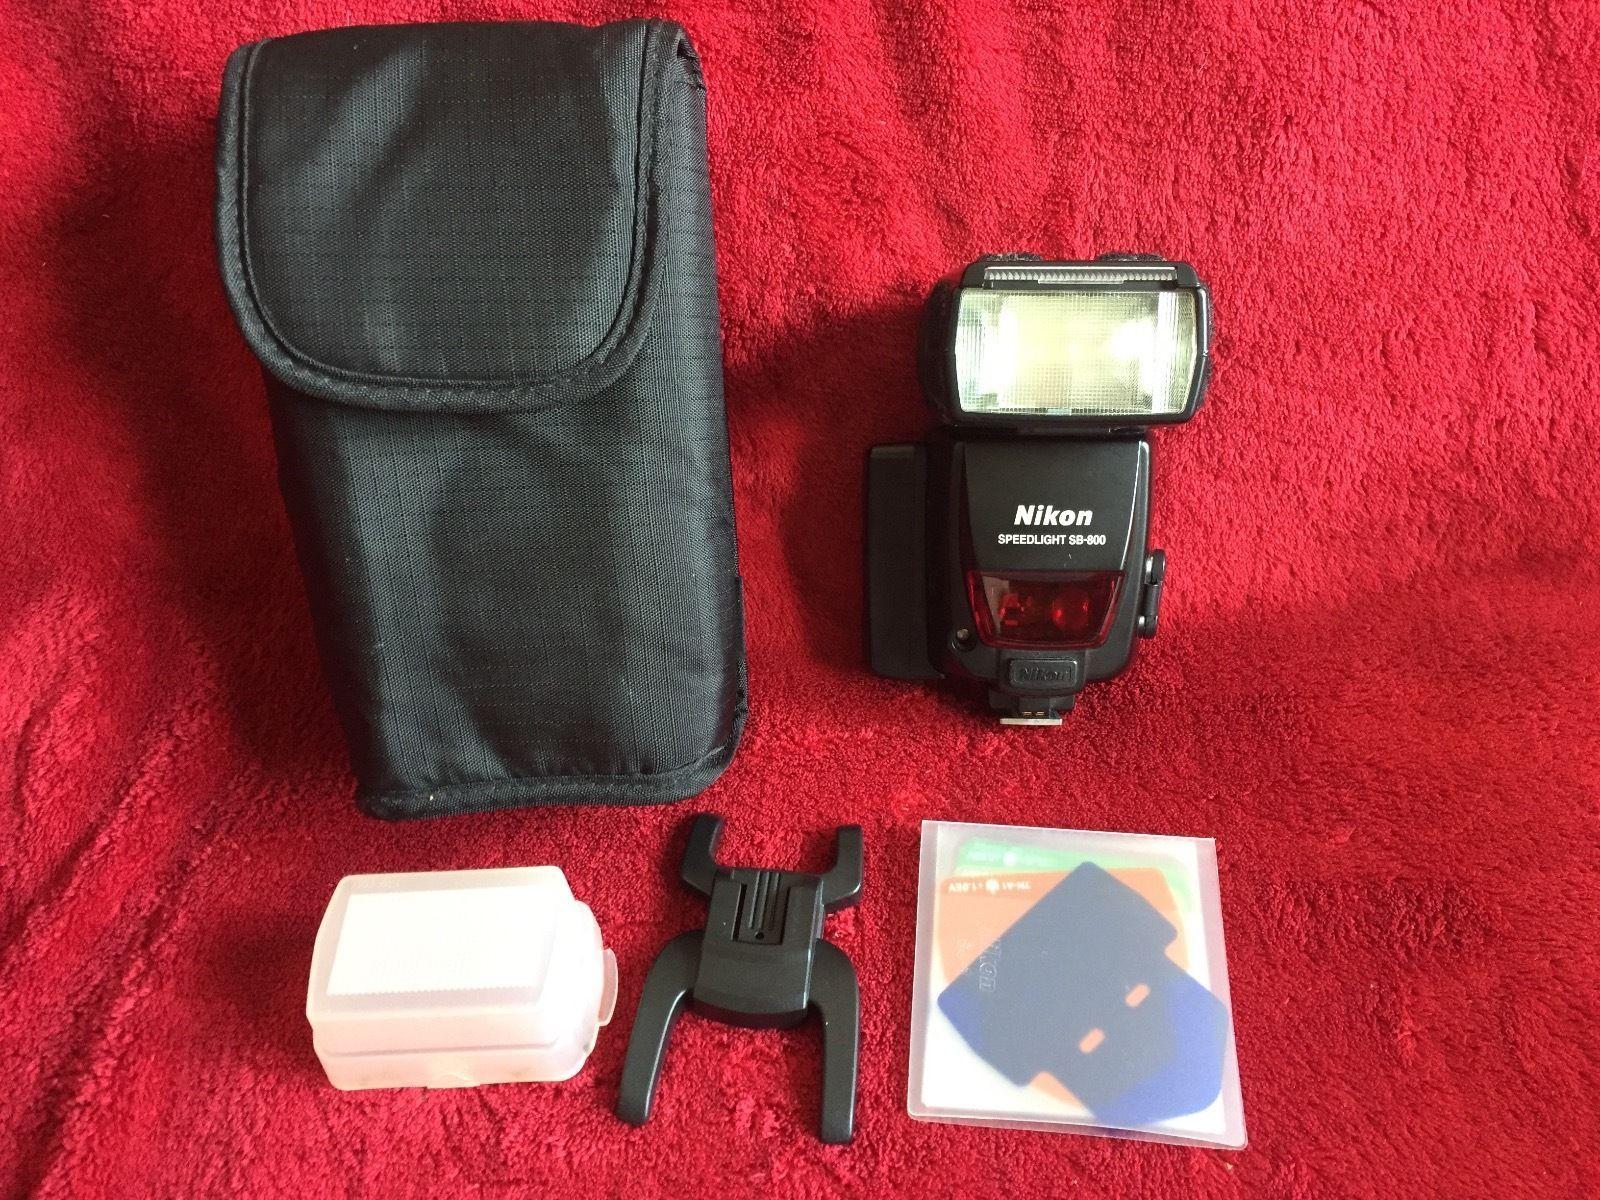 Nikon sb 800 speedlight flash unit with case good condition 1 nikon sb 800 speedlight flash unit with case good condition 1 baditri Images